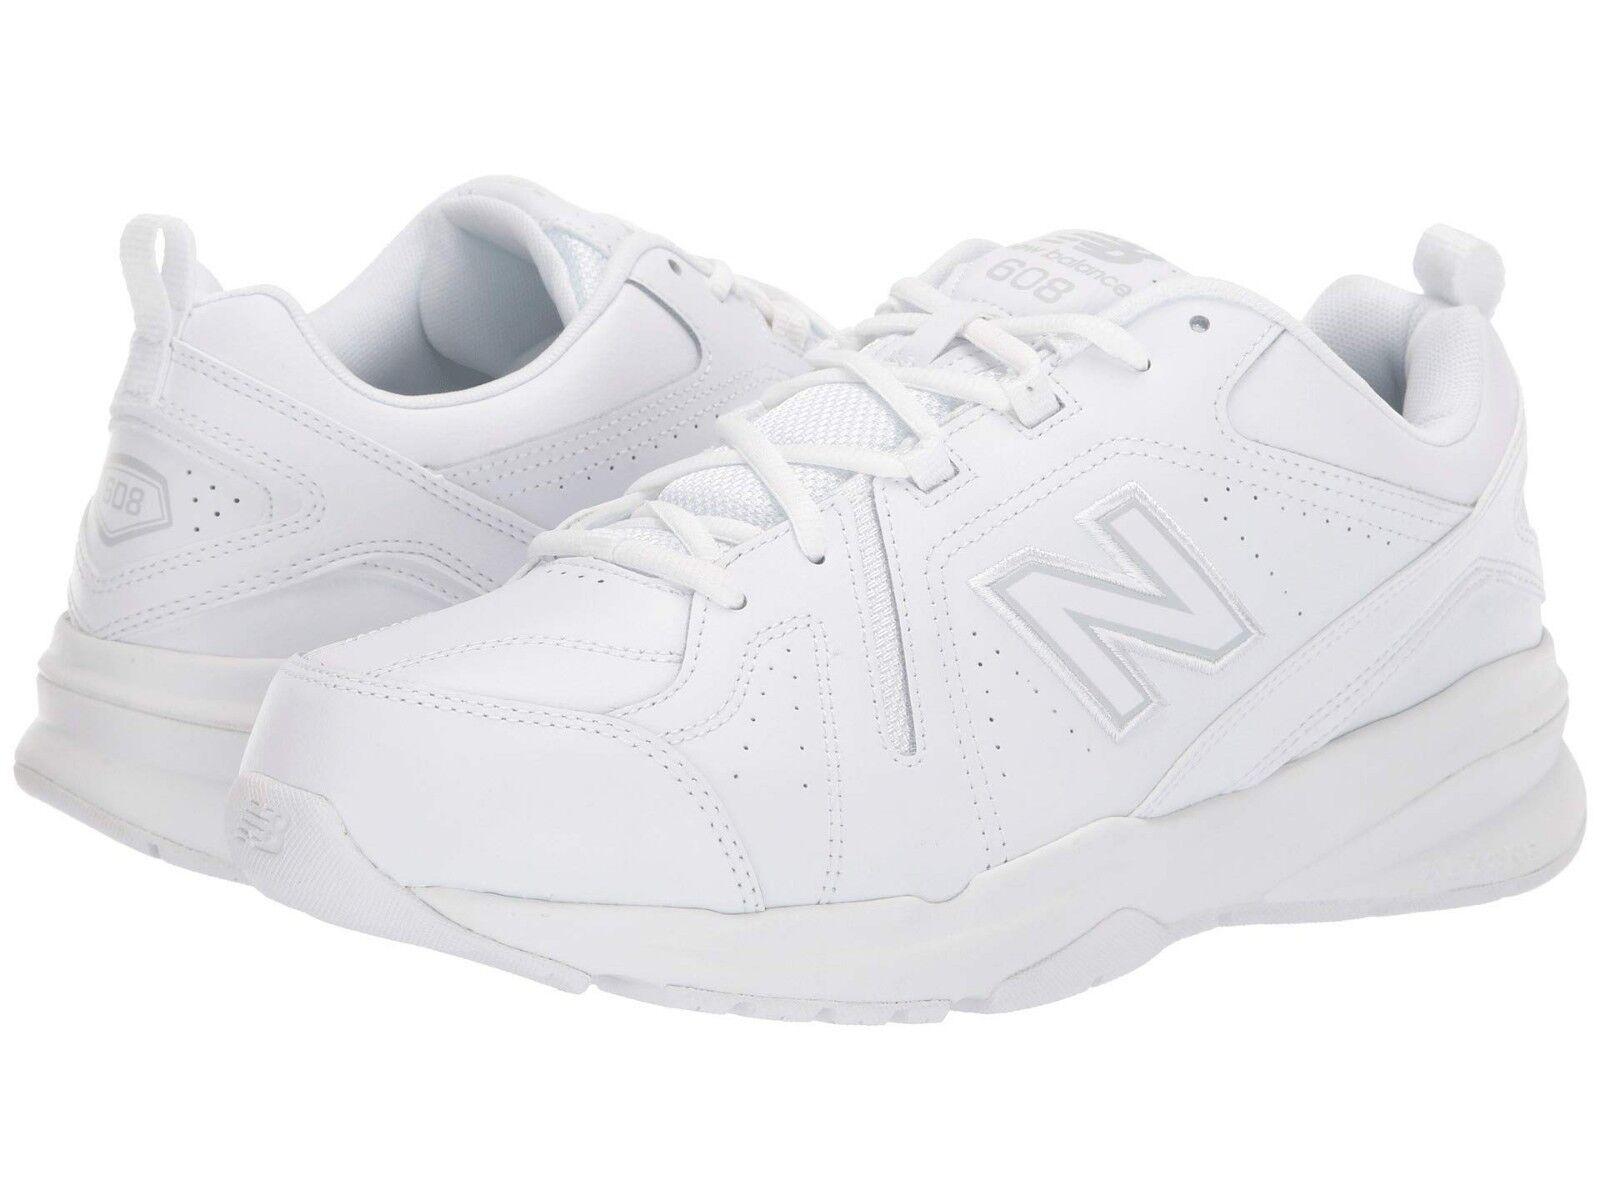 NEW Mens New Balance 608v5 White White Leather Athletic Training shoes AUTHENTIC